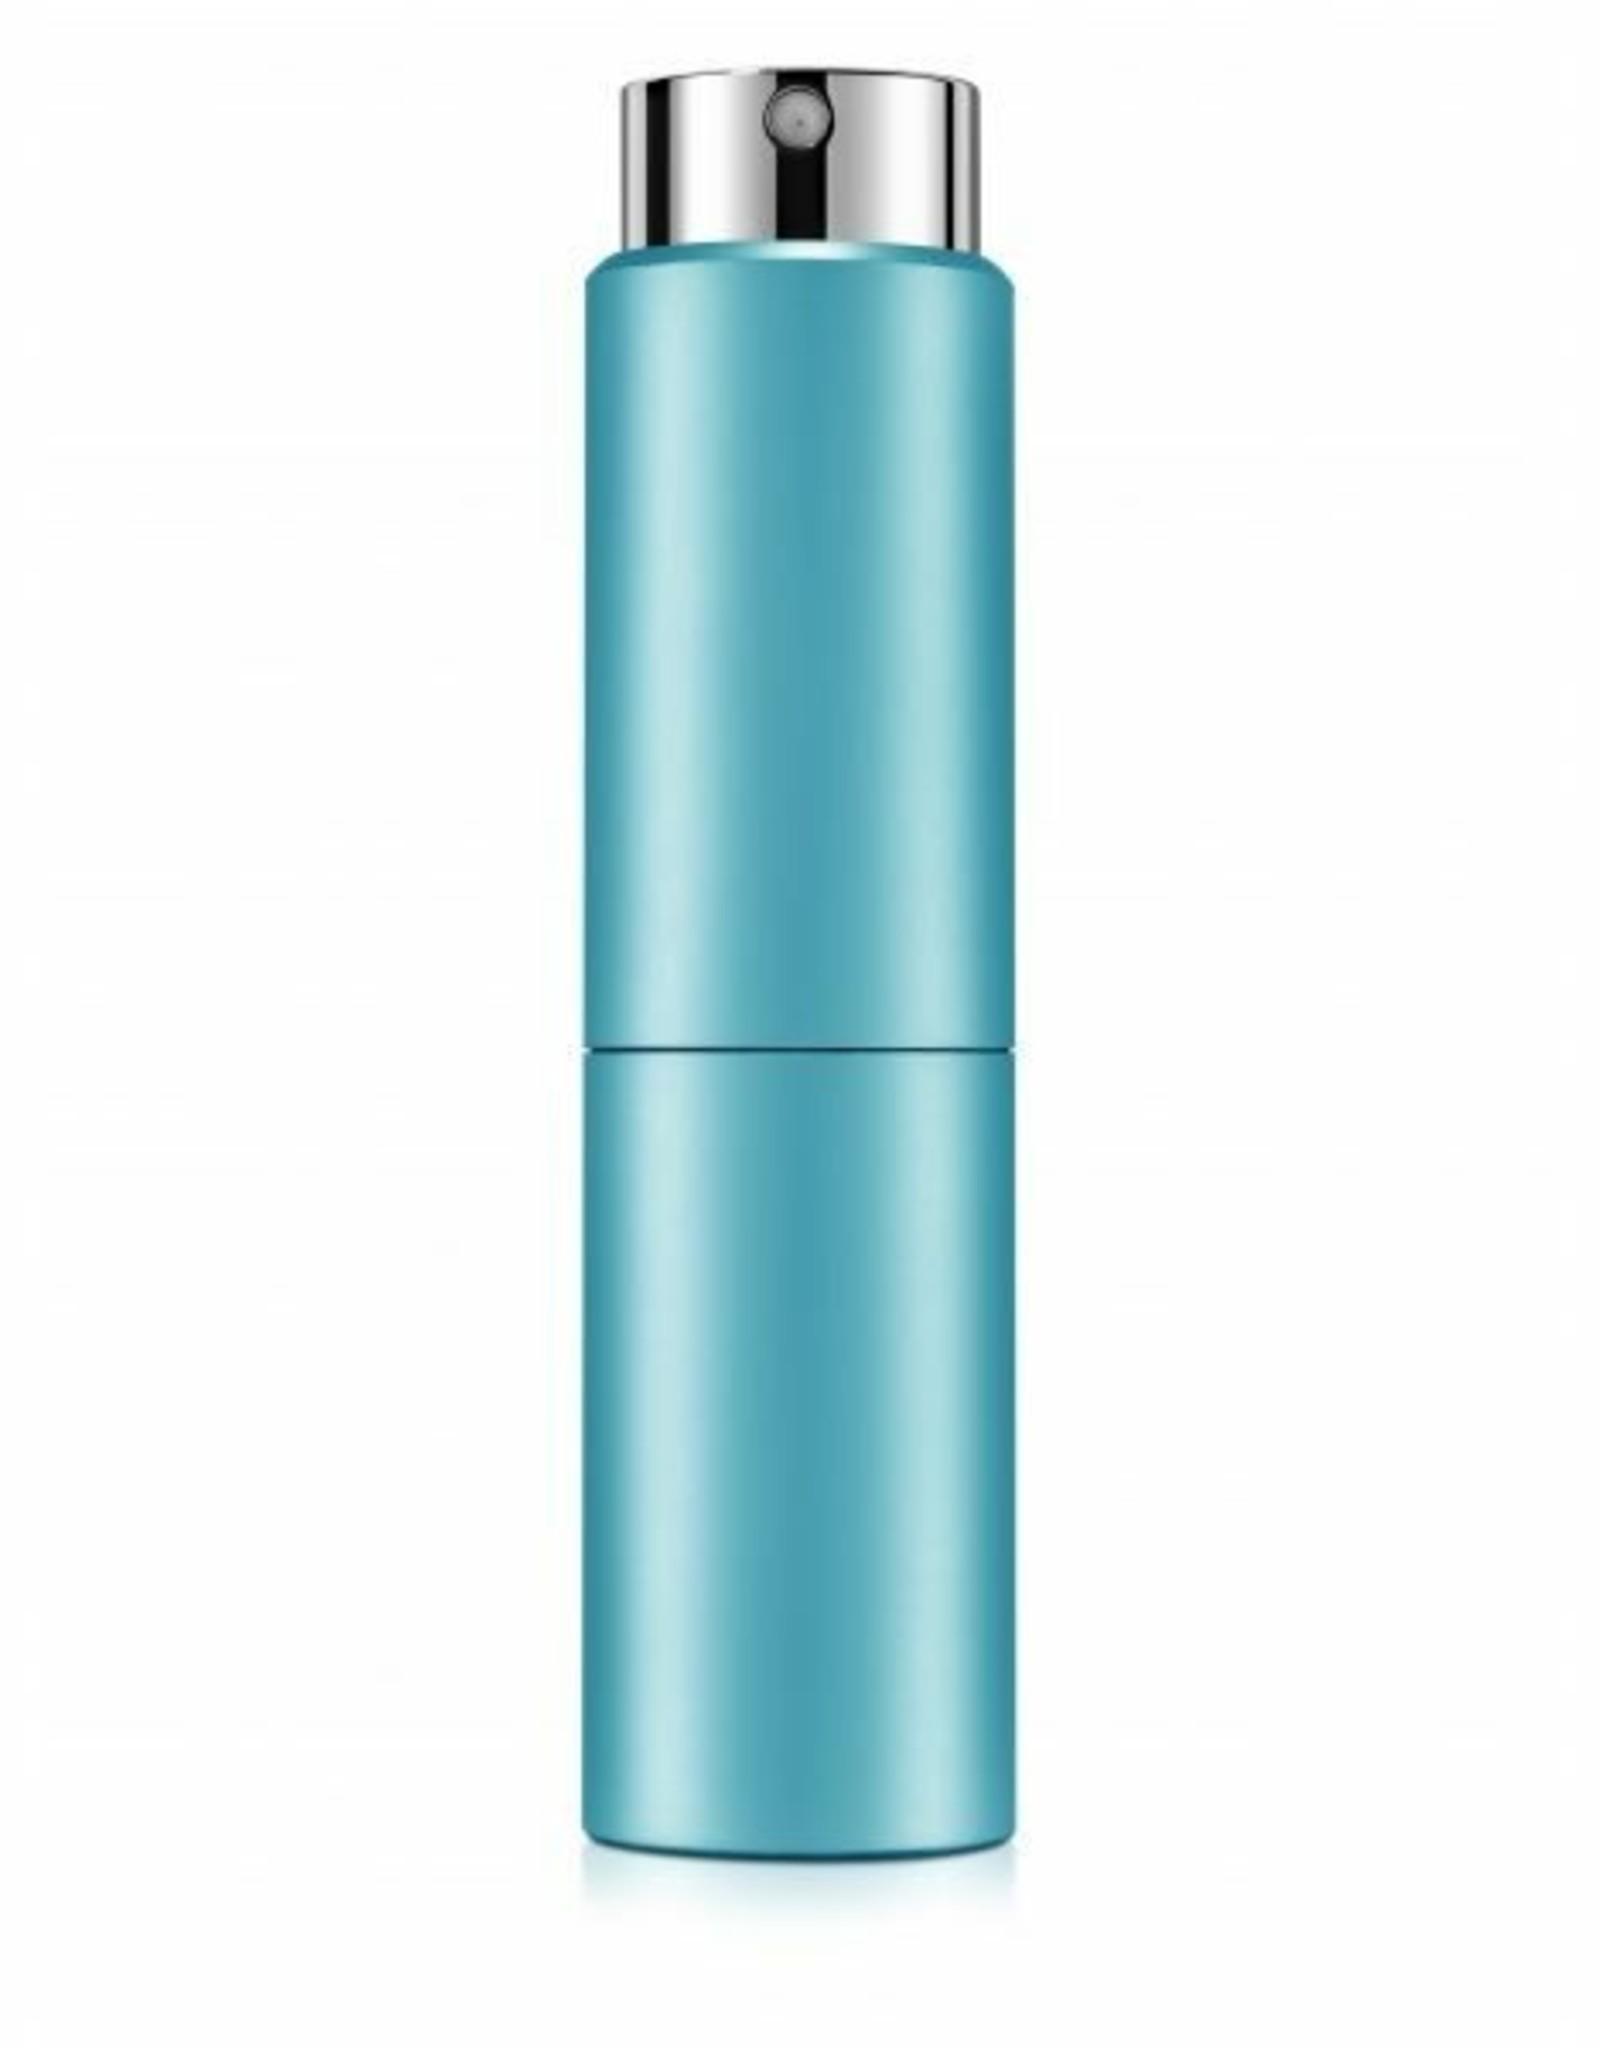 Equivalenza Vaporisateur de Parfum Bleu - 15ml